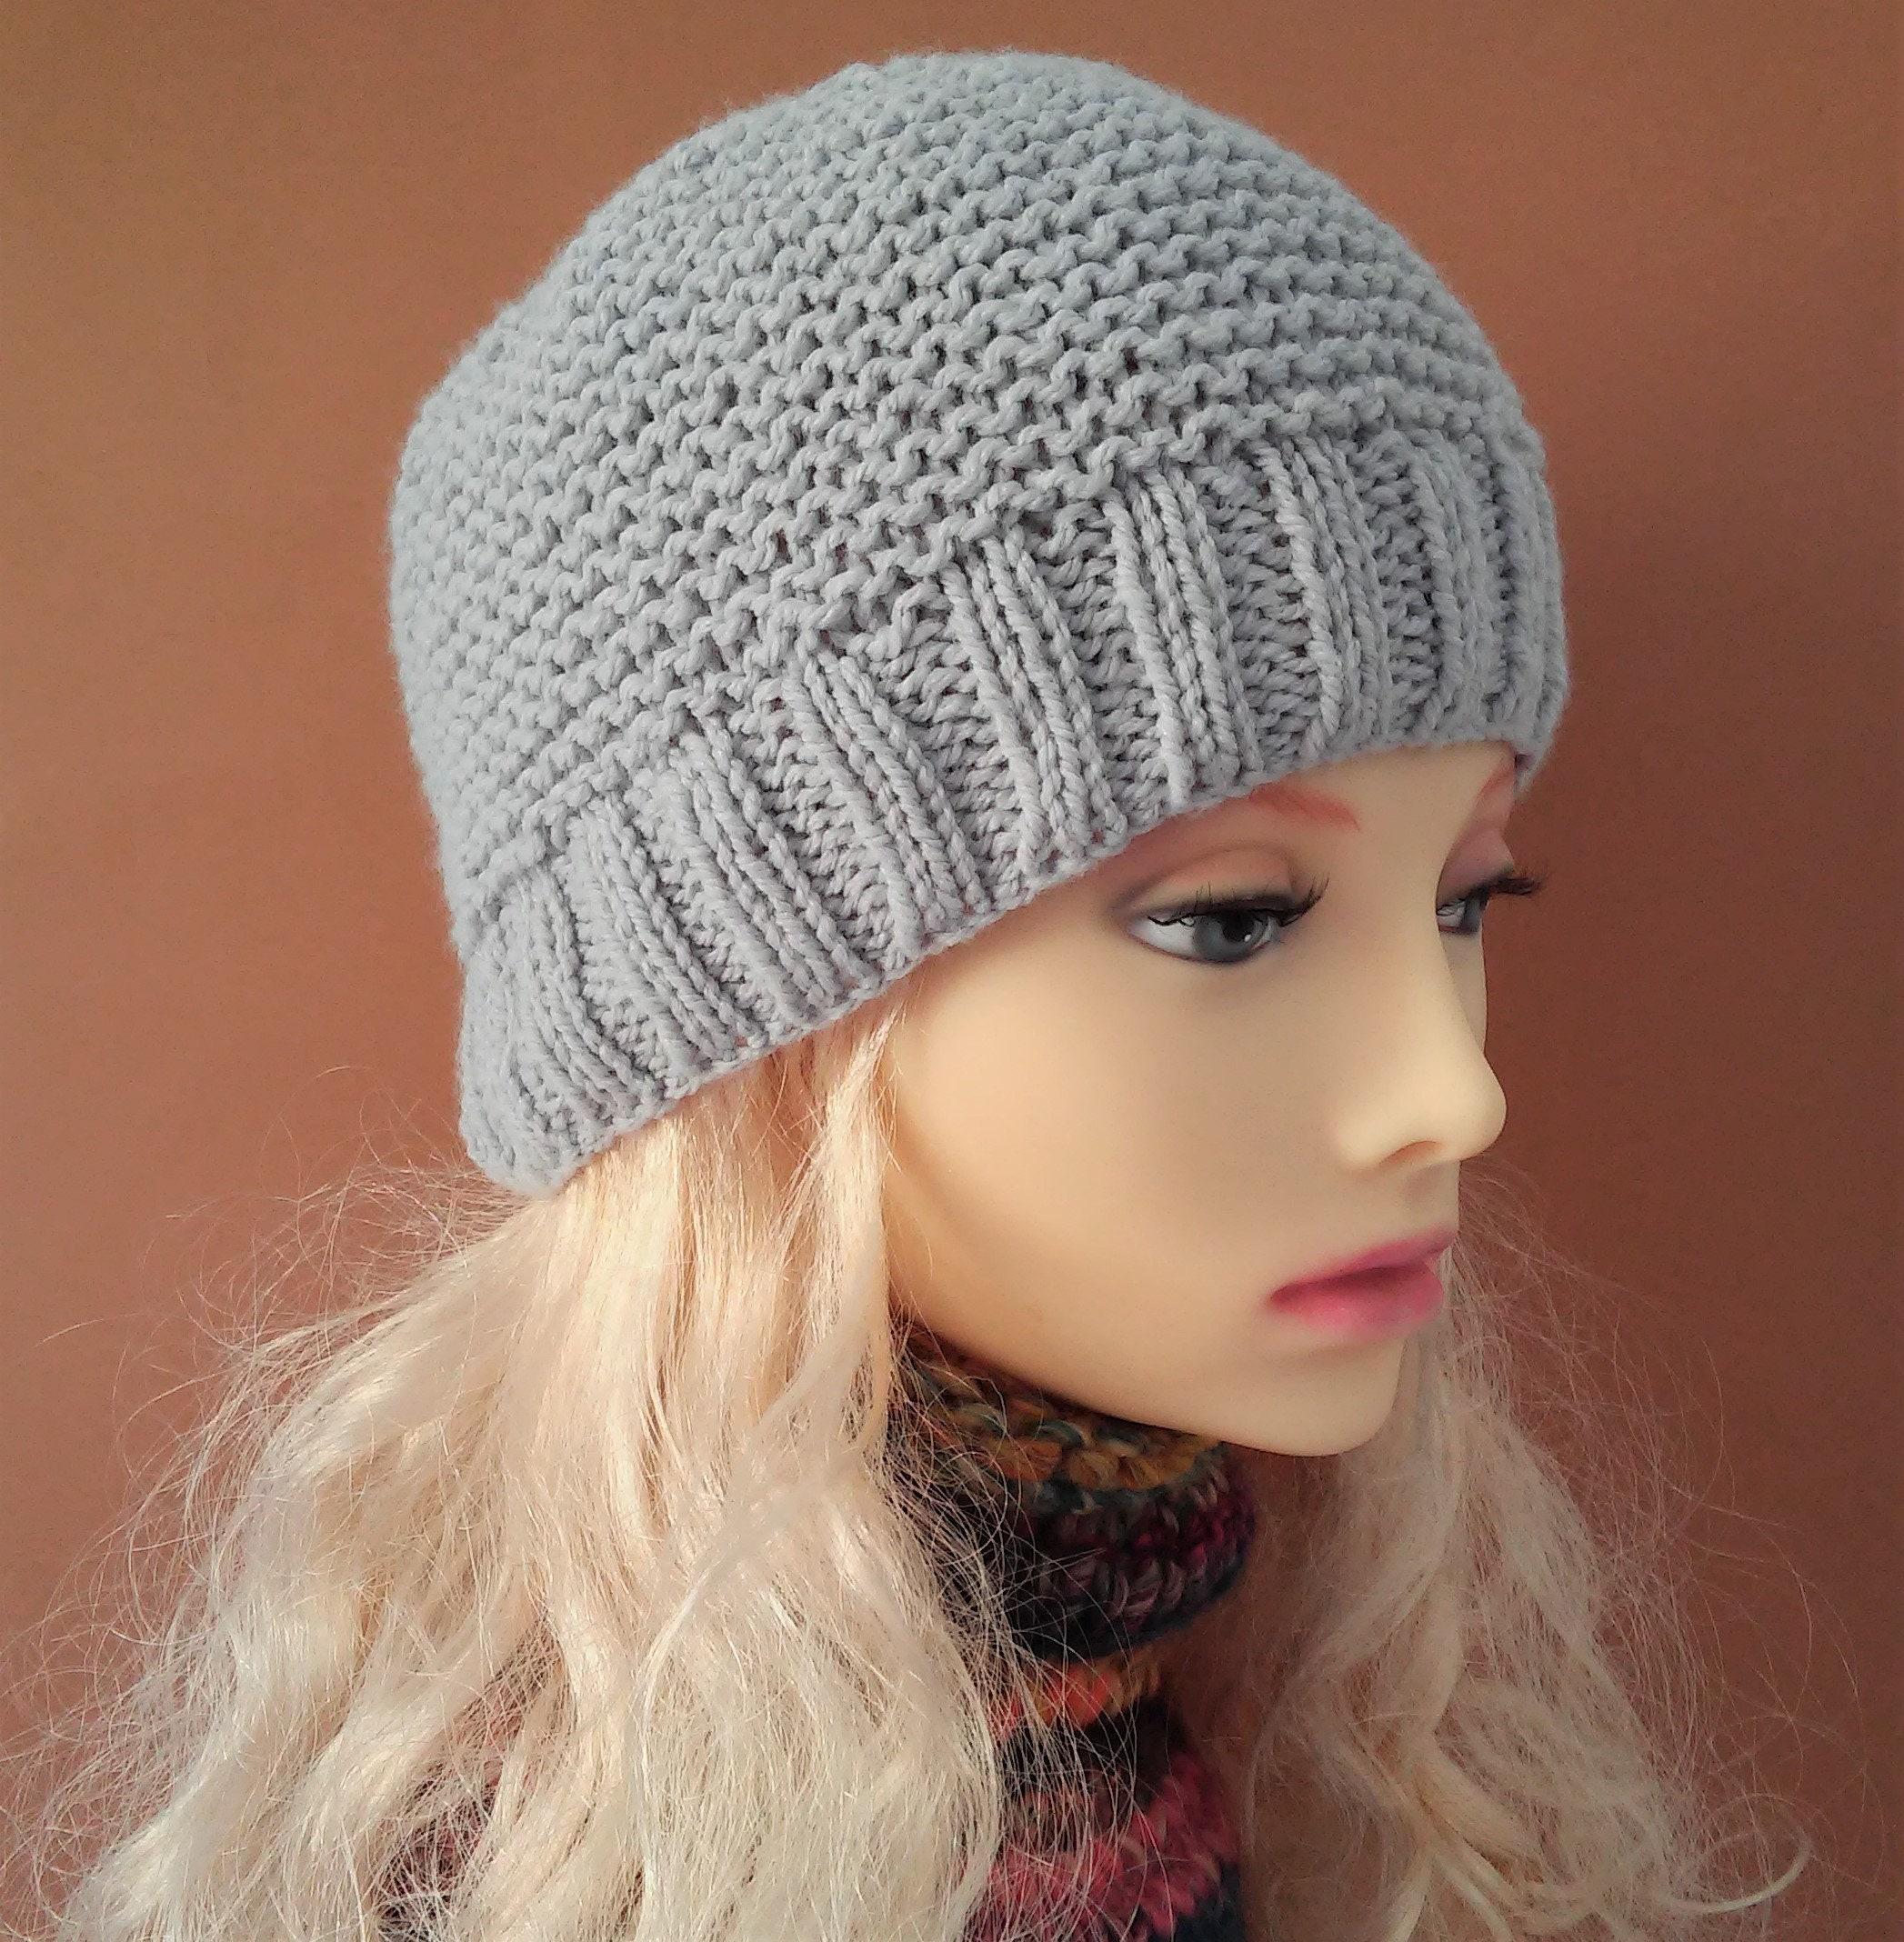 BEANIE KNITTING PATTERNS Womens Beanie Hat Knit Flat Easy ...